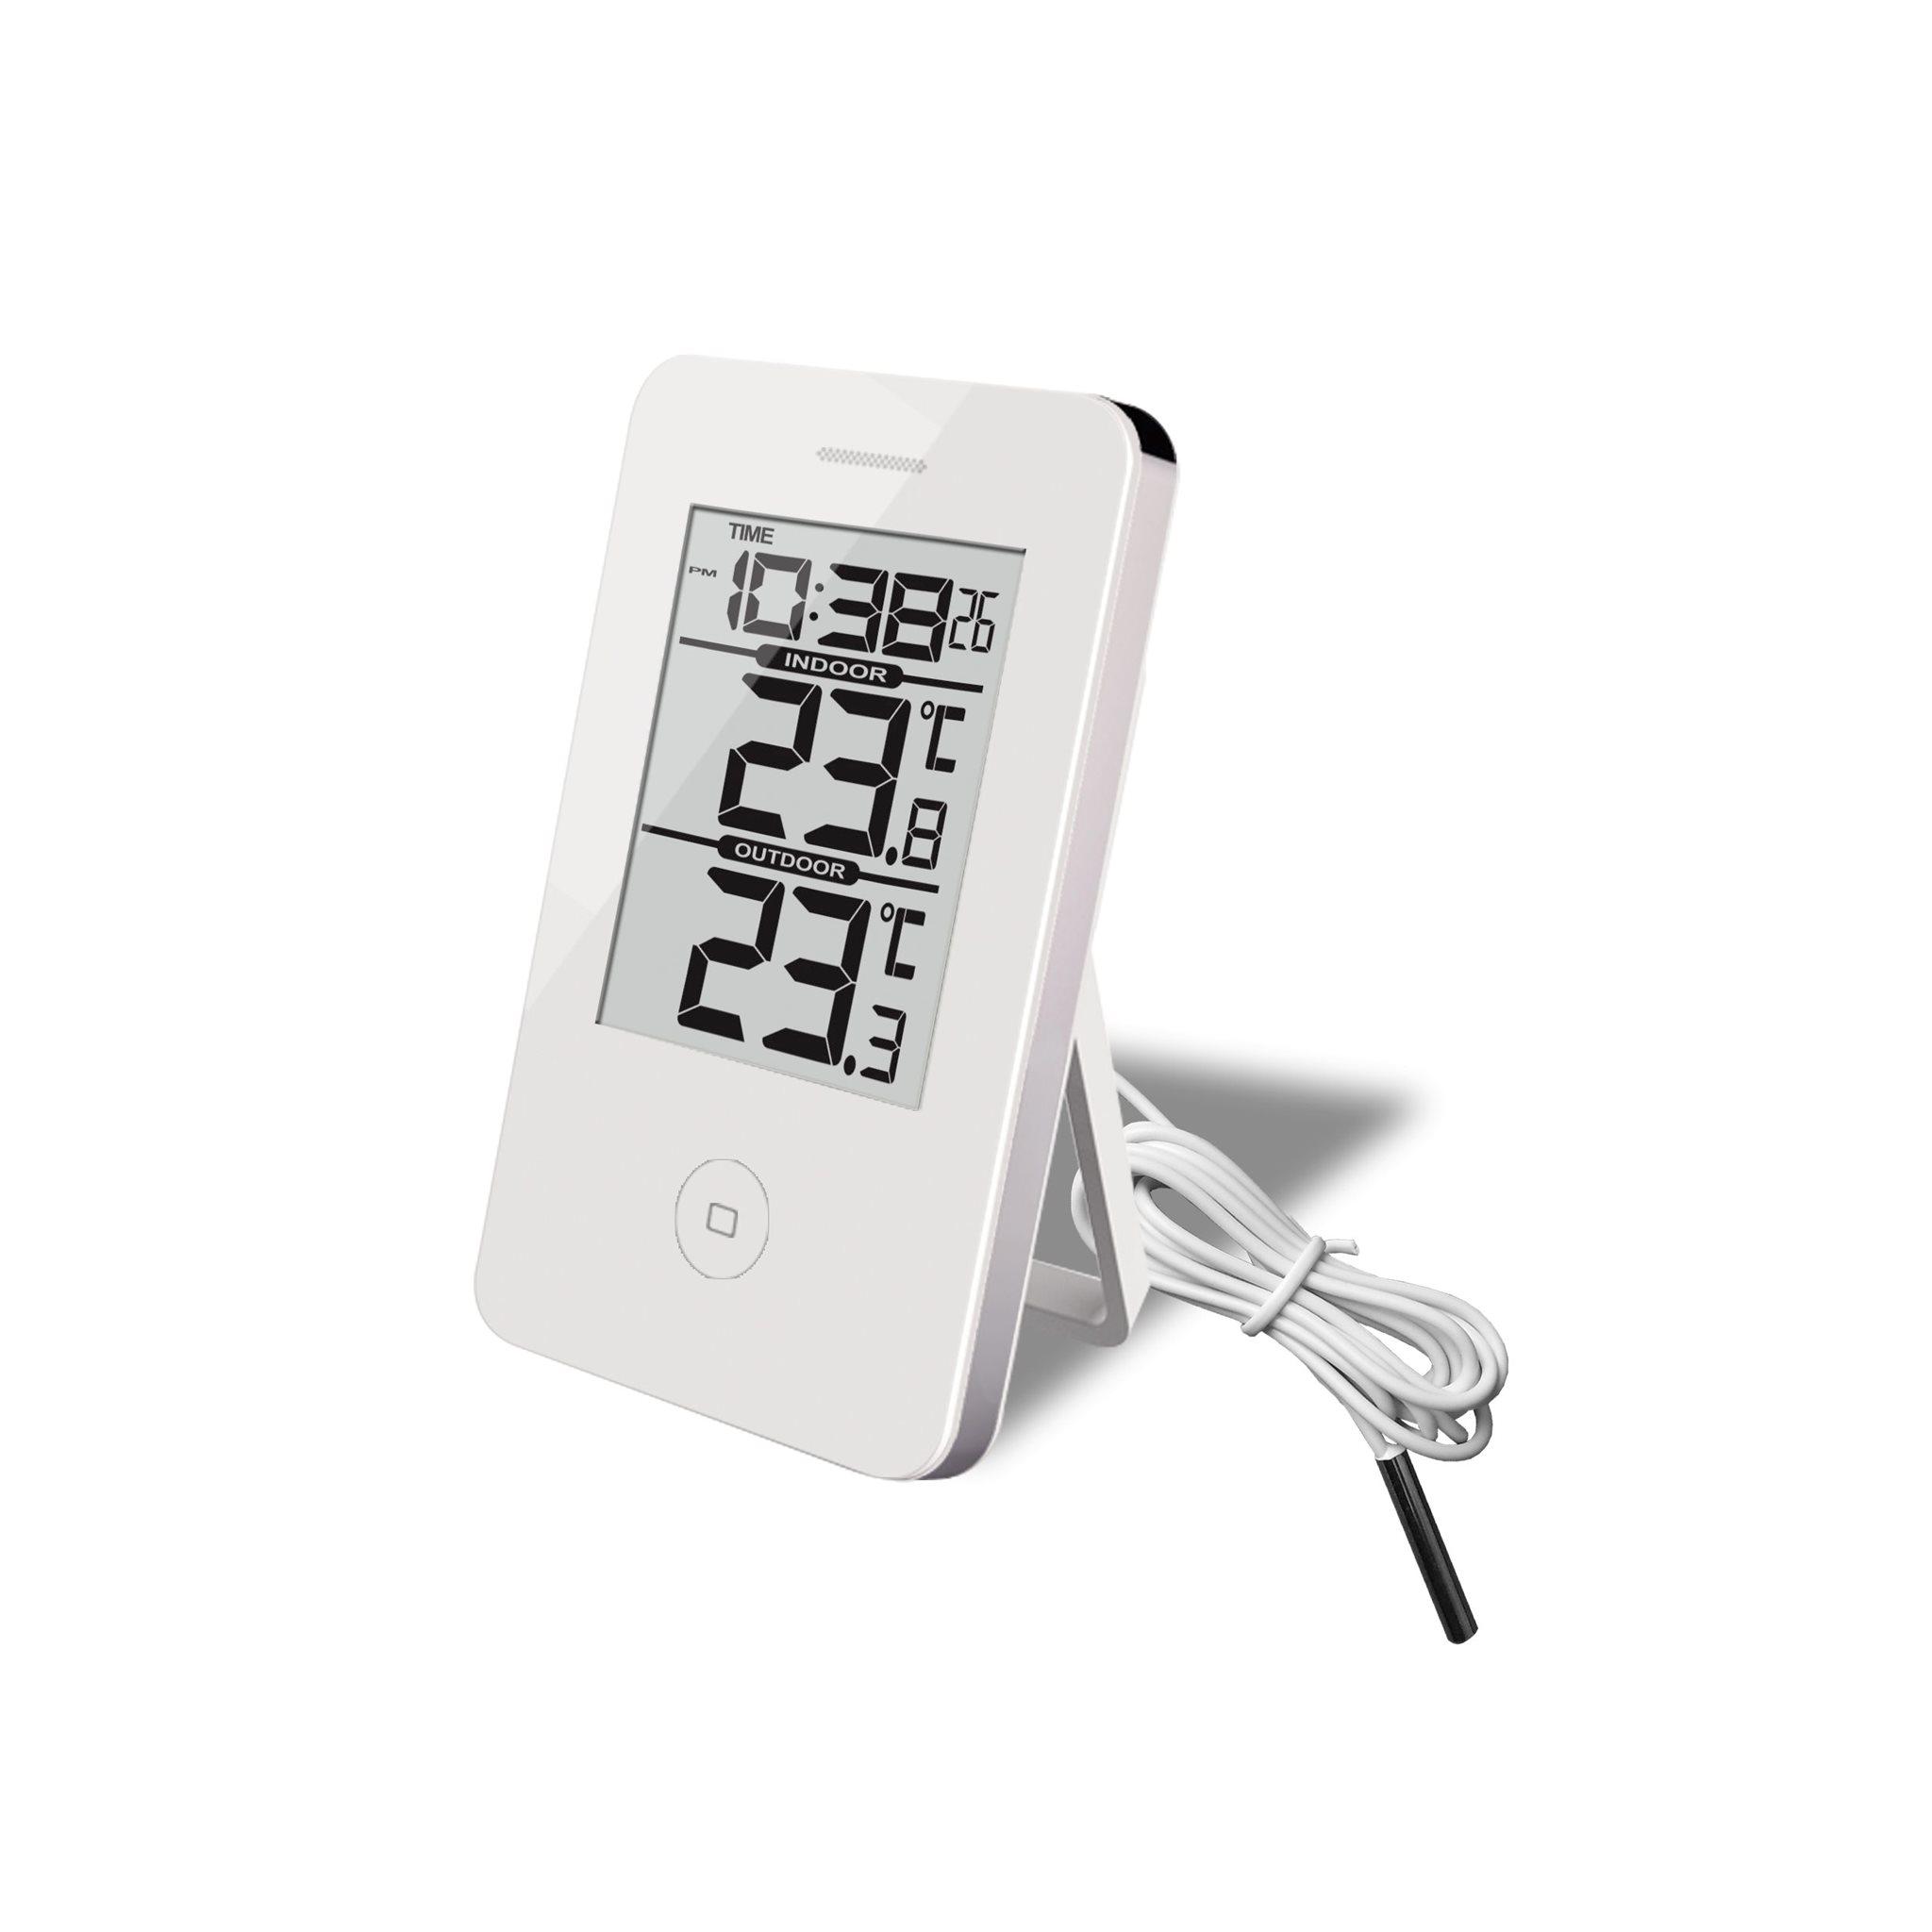 TERMOMETERFABRIKEN Termometer .. (342098663) ᐈ digitalwarehouse på ... d121b9cd1a1a0